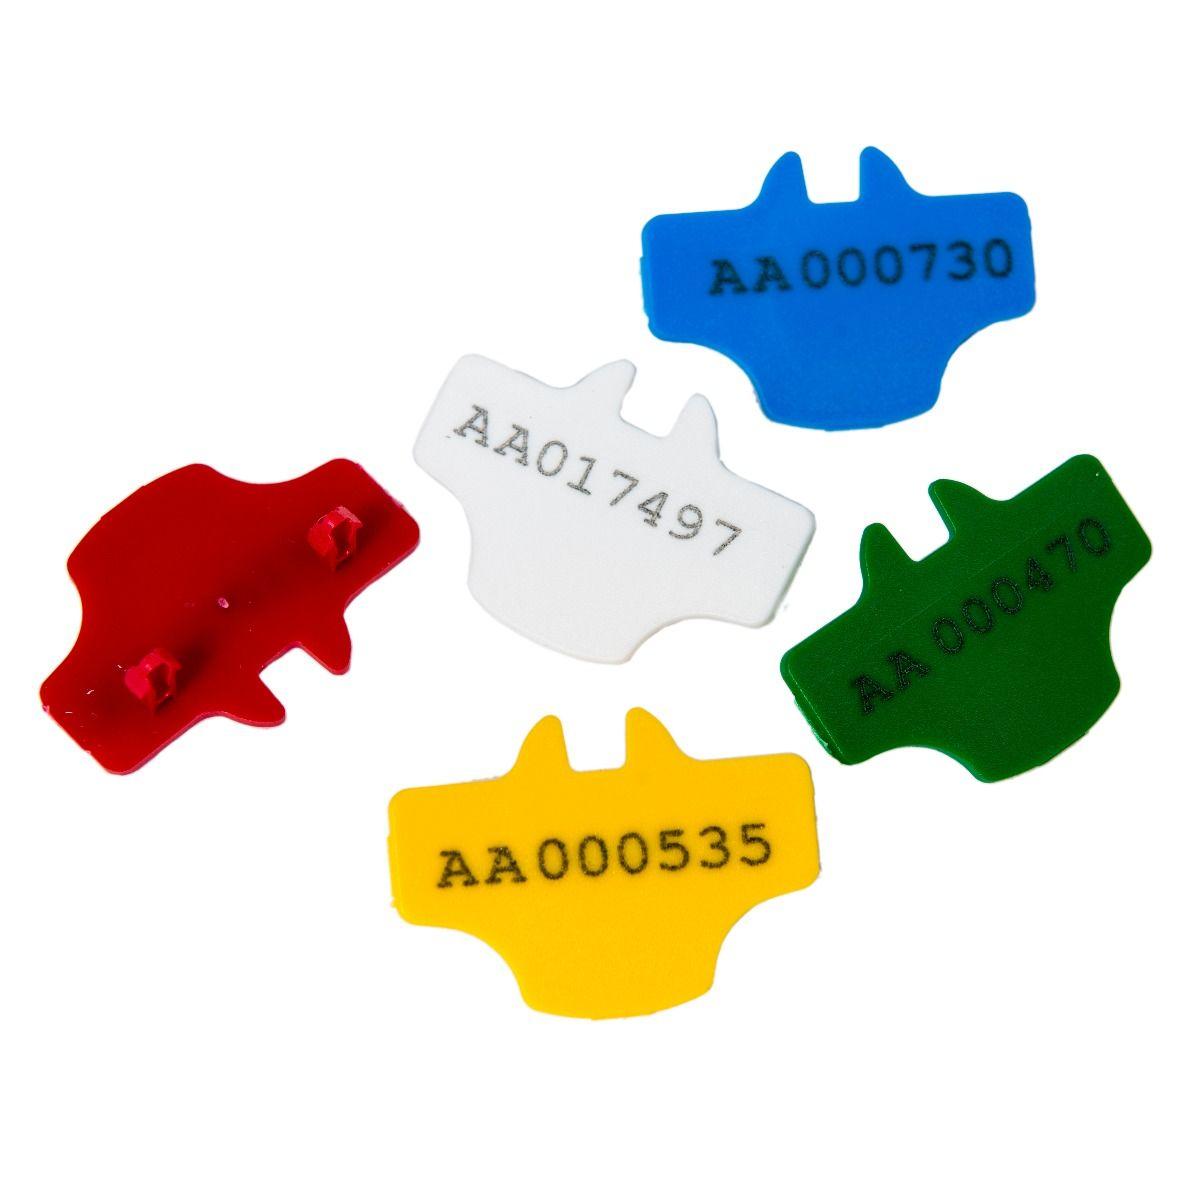 Numbered T2 Tamper Evident Security Seals